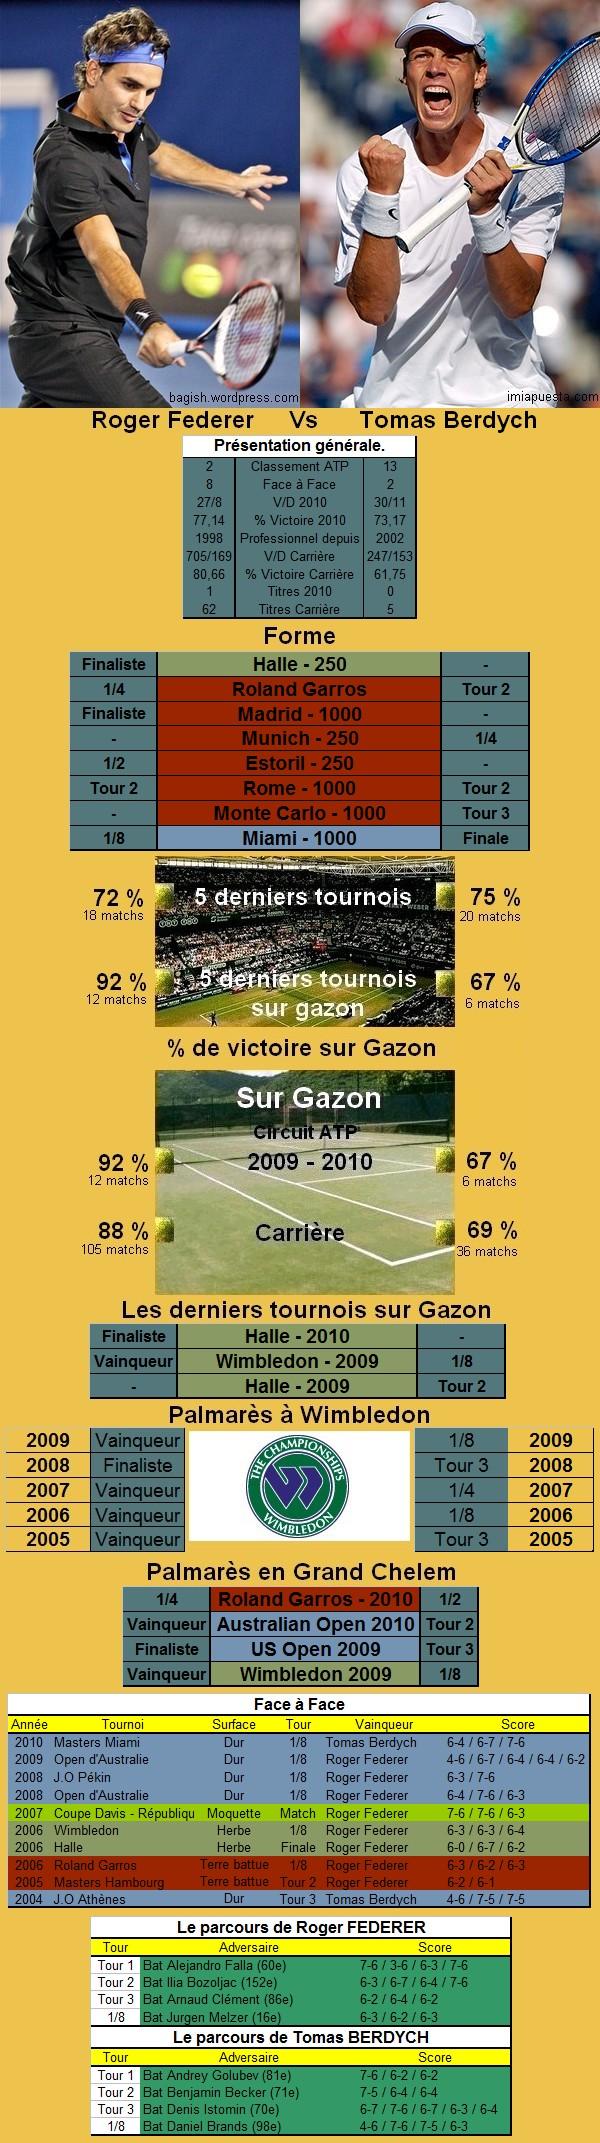 Statistiques tennis de Federer contre Berdych à Wimbledon